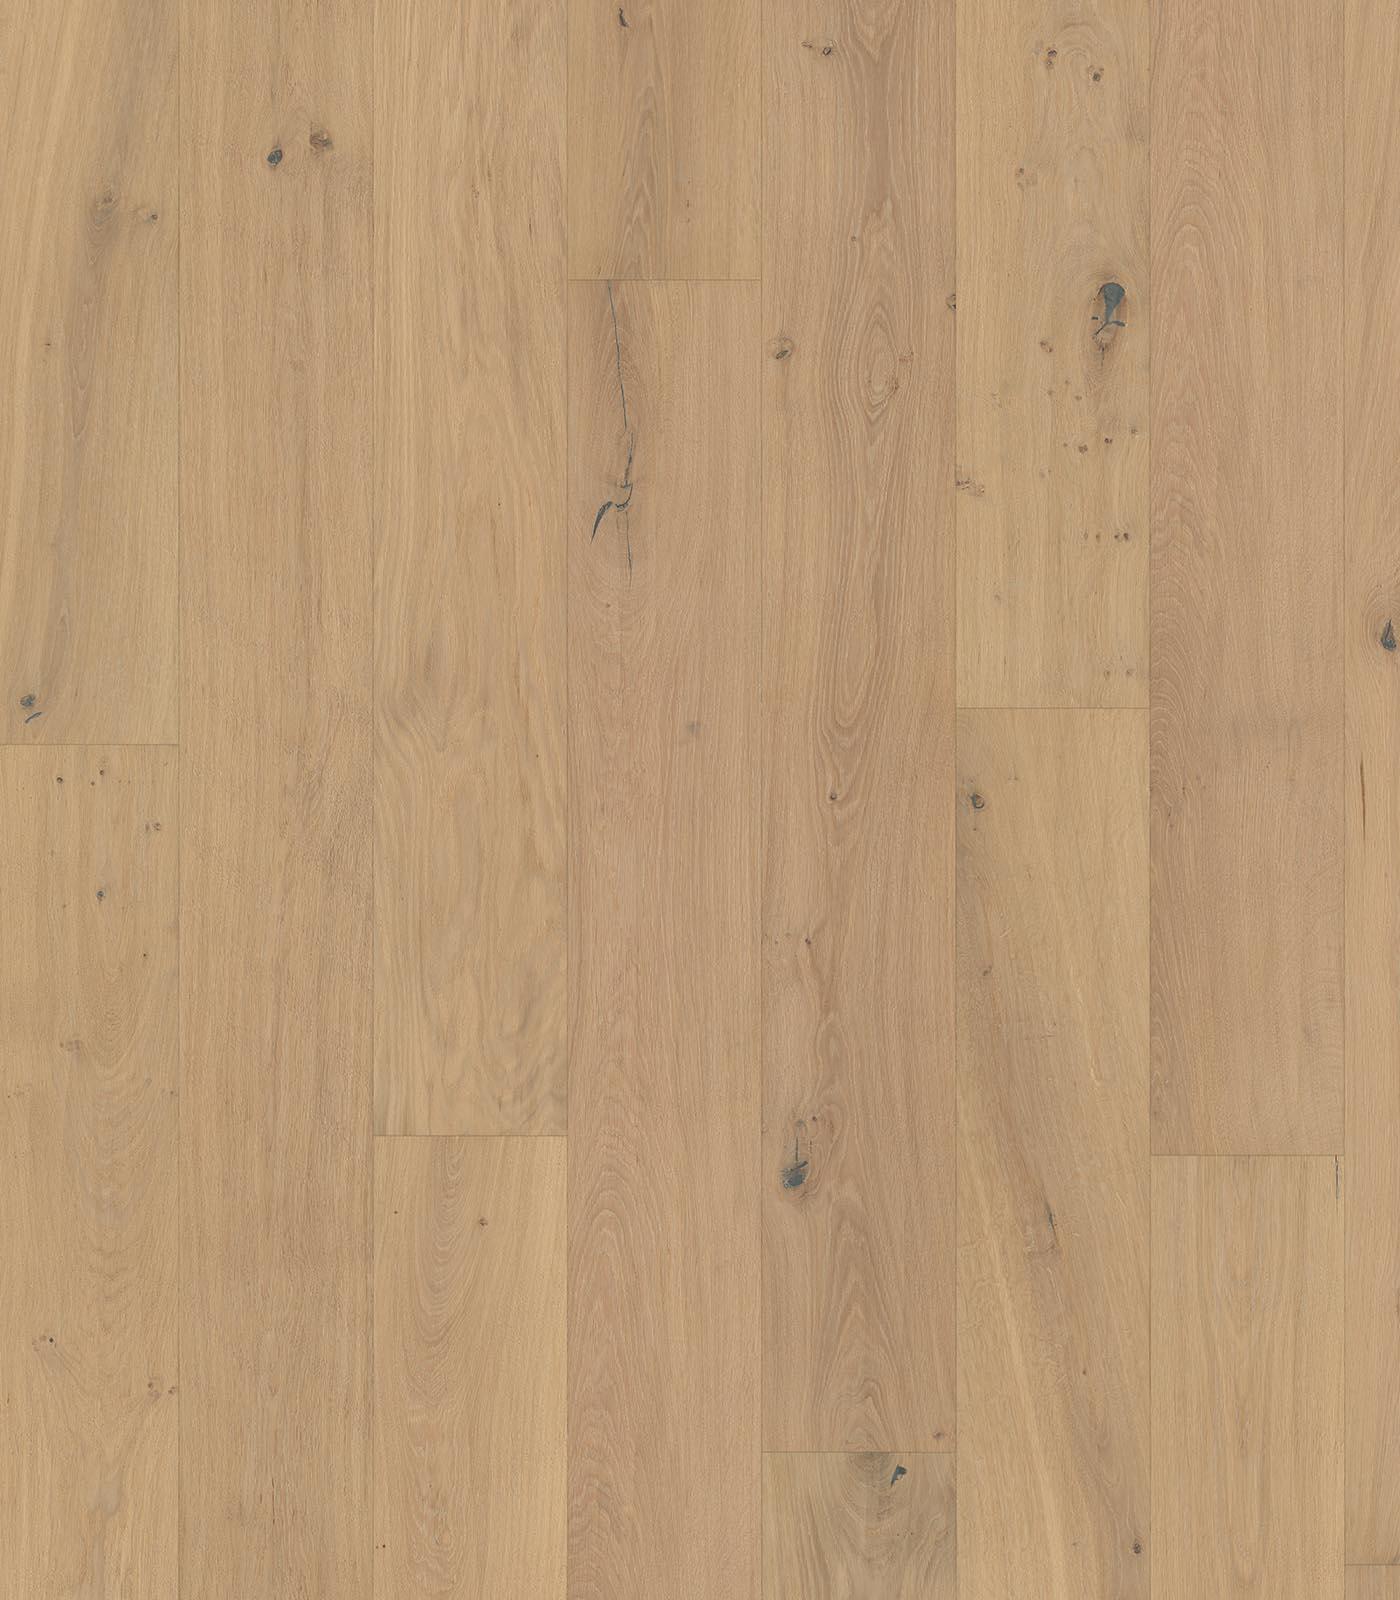 Cotopaxi Antique Collection European Oak Flooring-flat